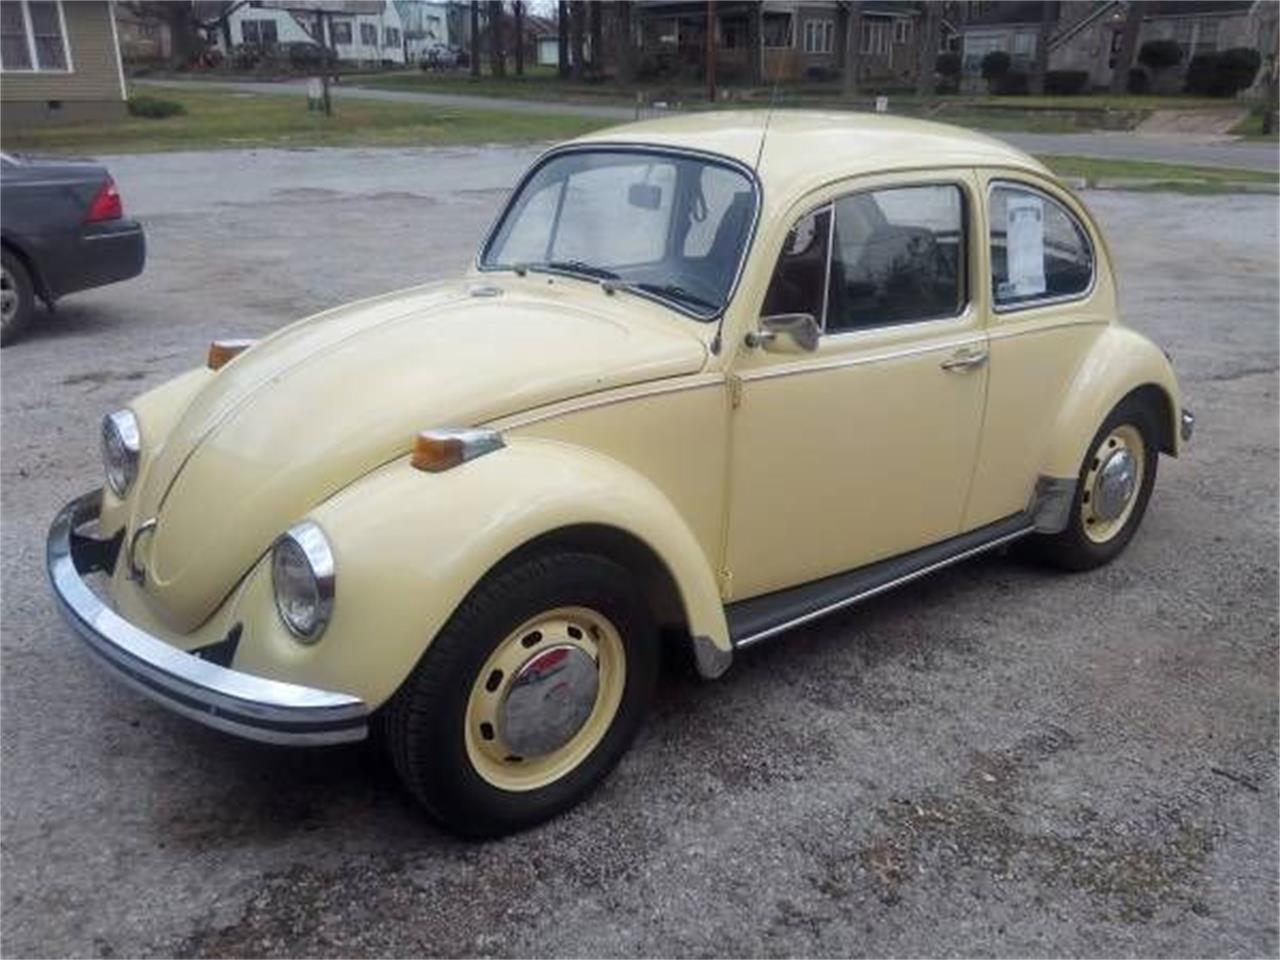 1970 Volkswagen Beetle For Sale Classiccars Com Cc 1115304